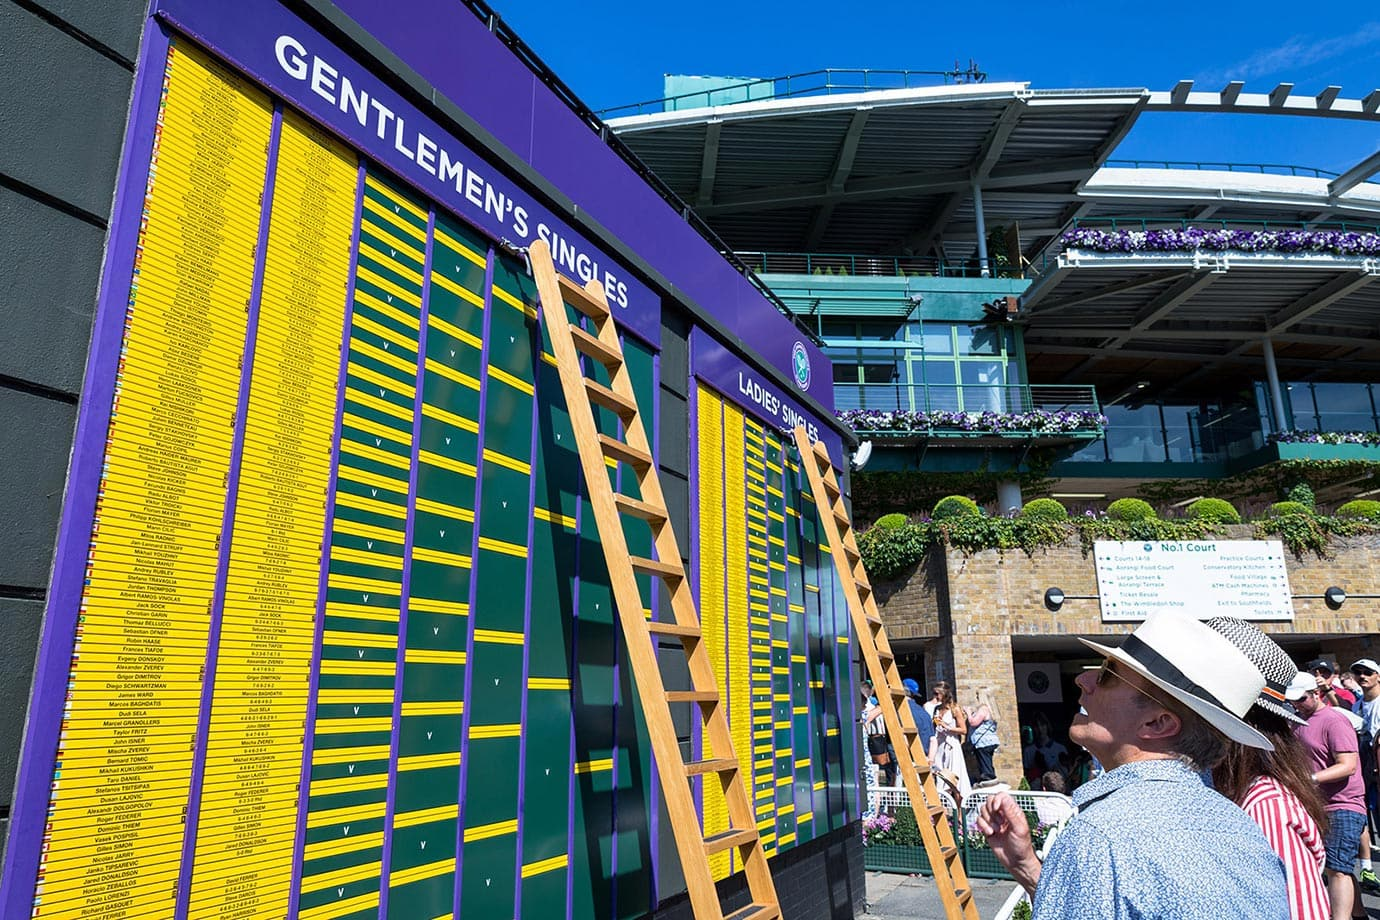 Order of Play board, Wimbledon